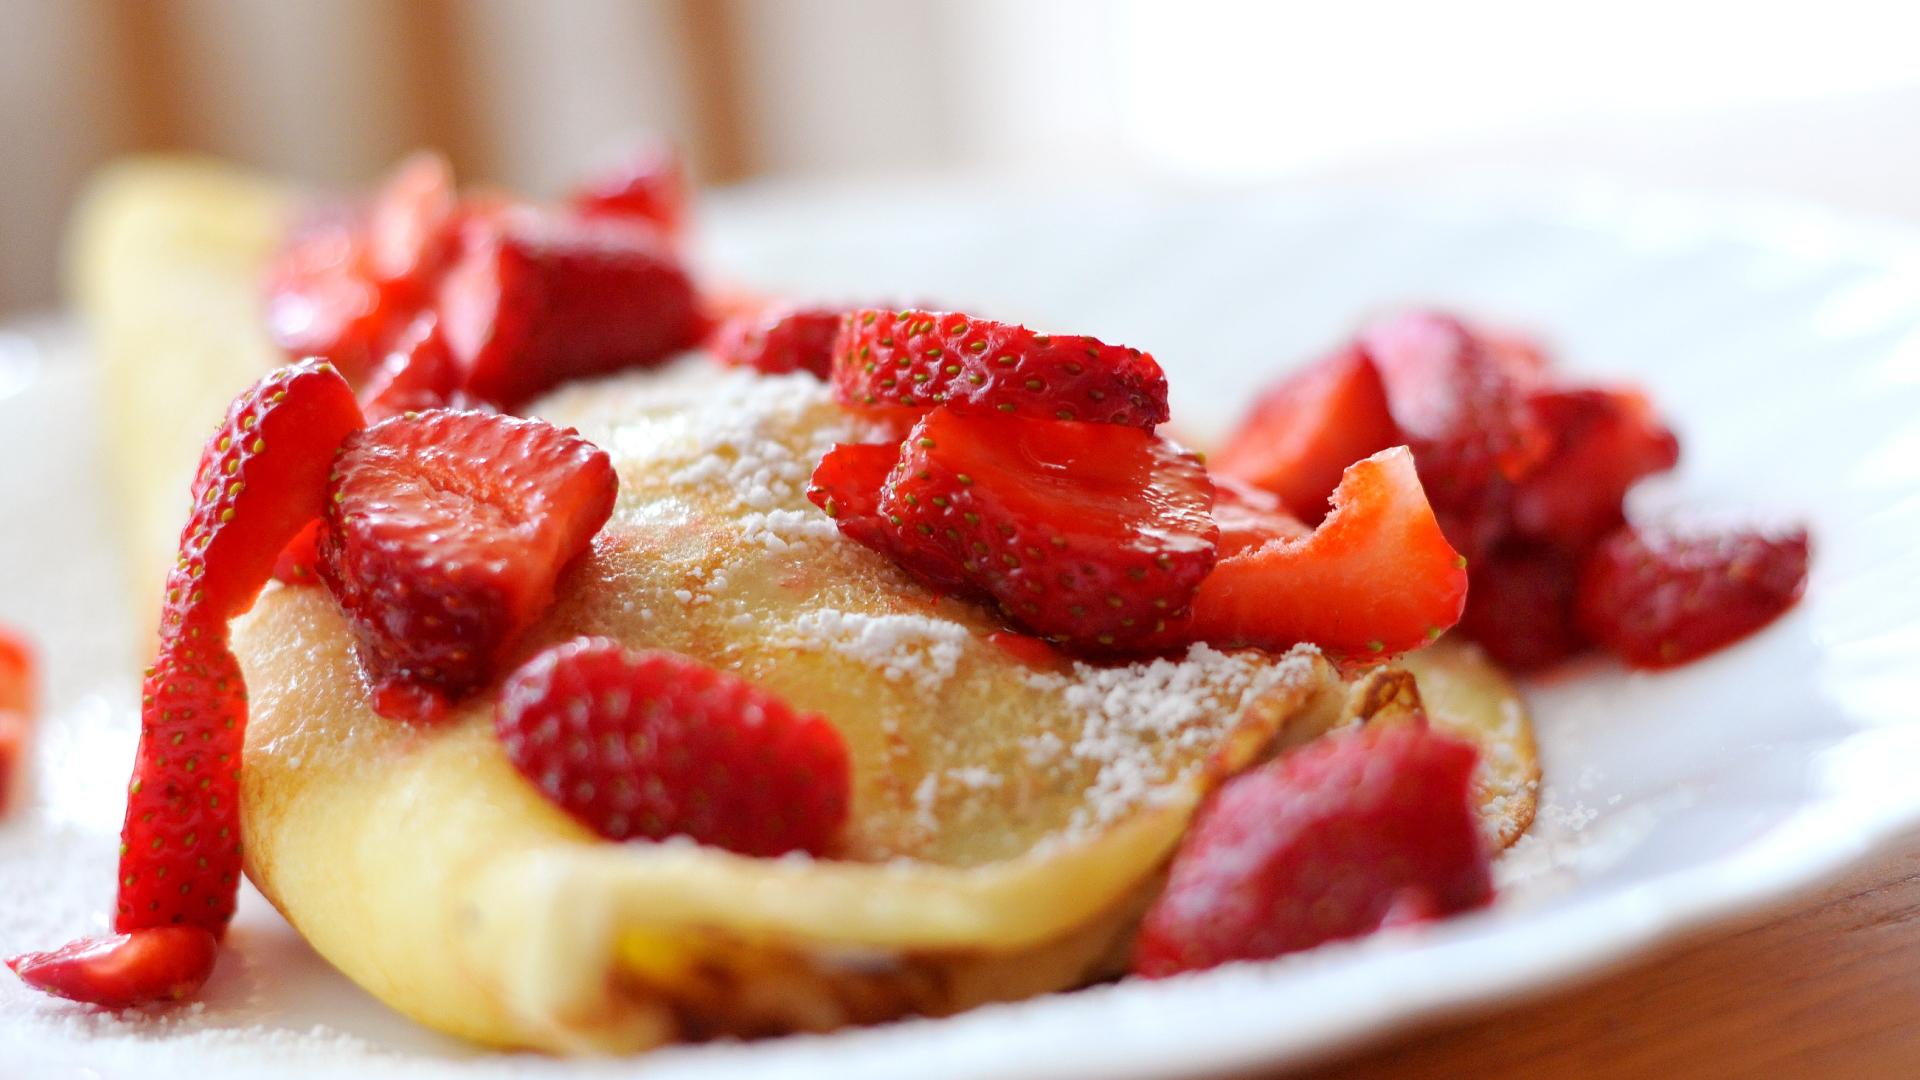 The Pancake Bar